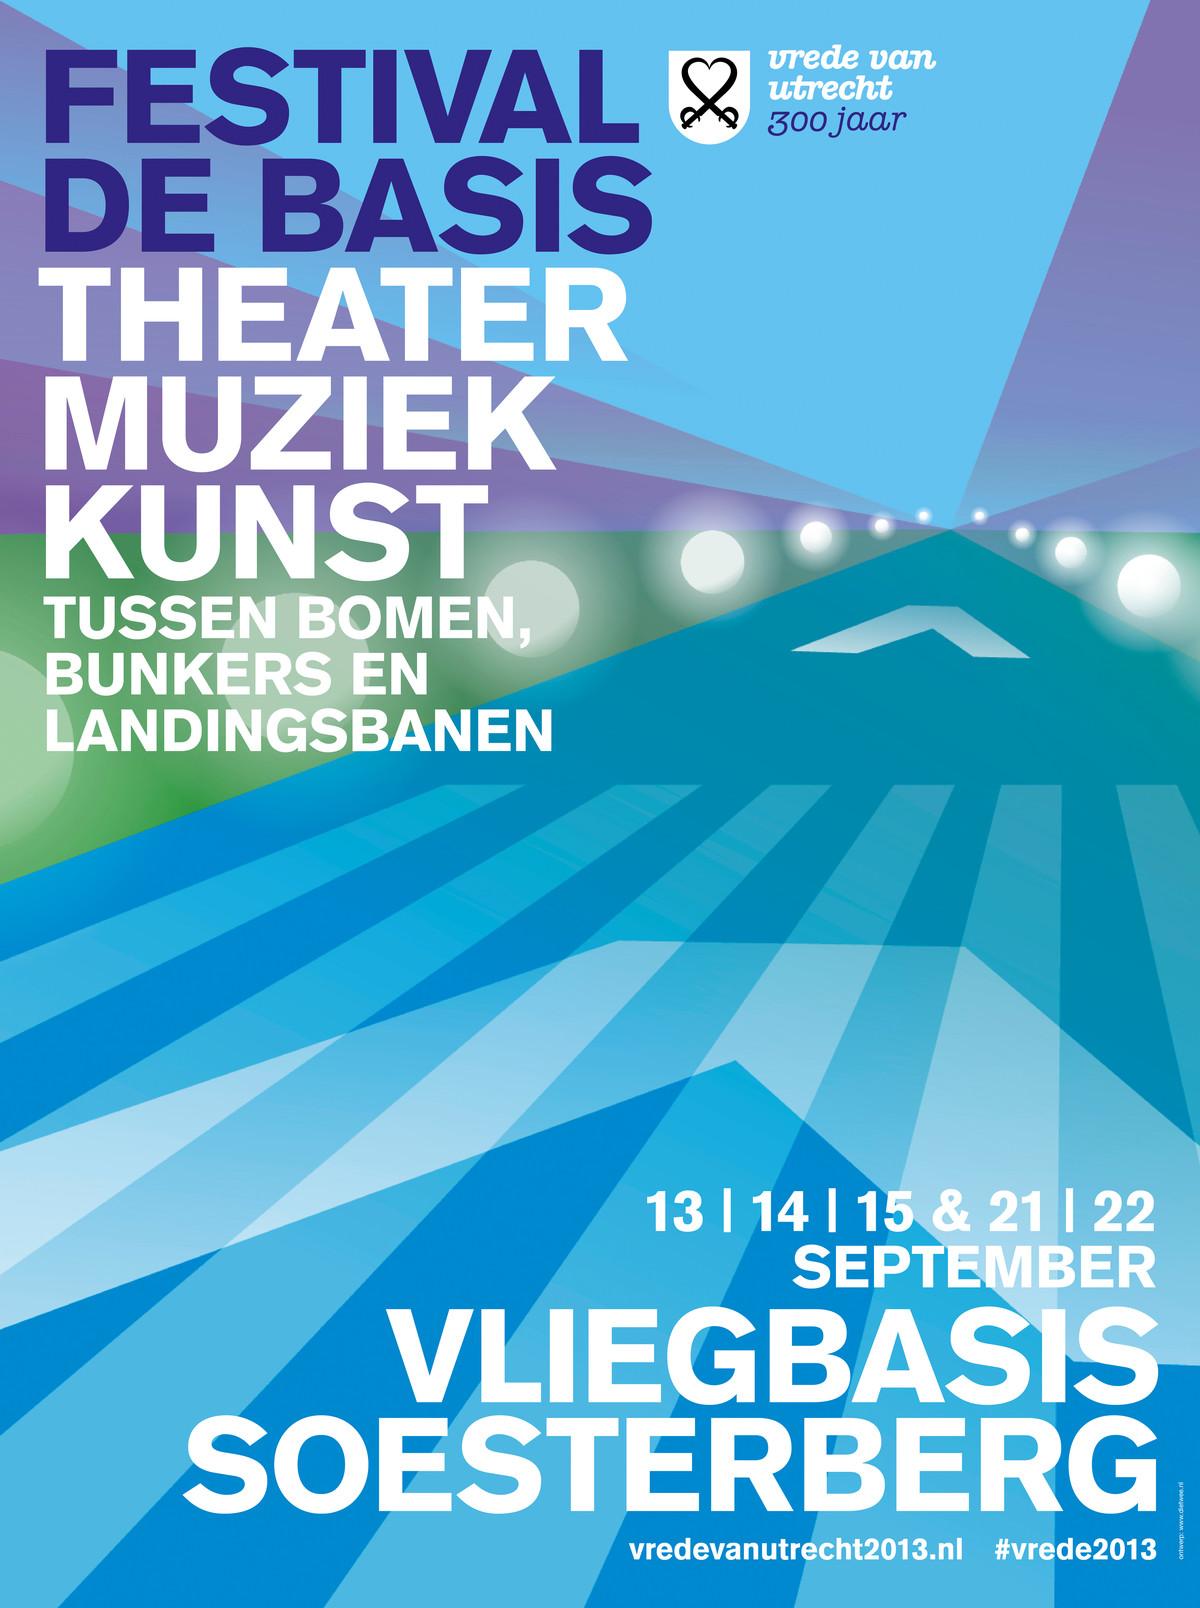 vvu-campagne-2013-festival-de-basis.jpg